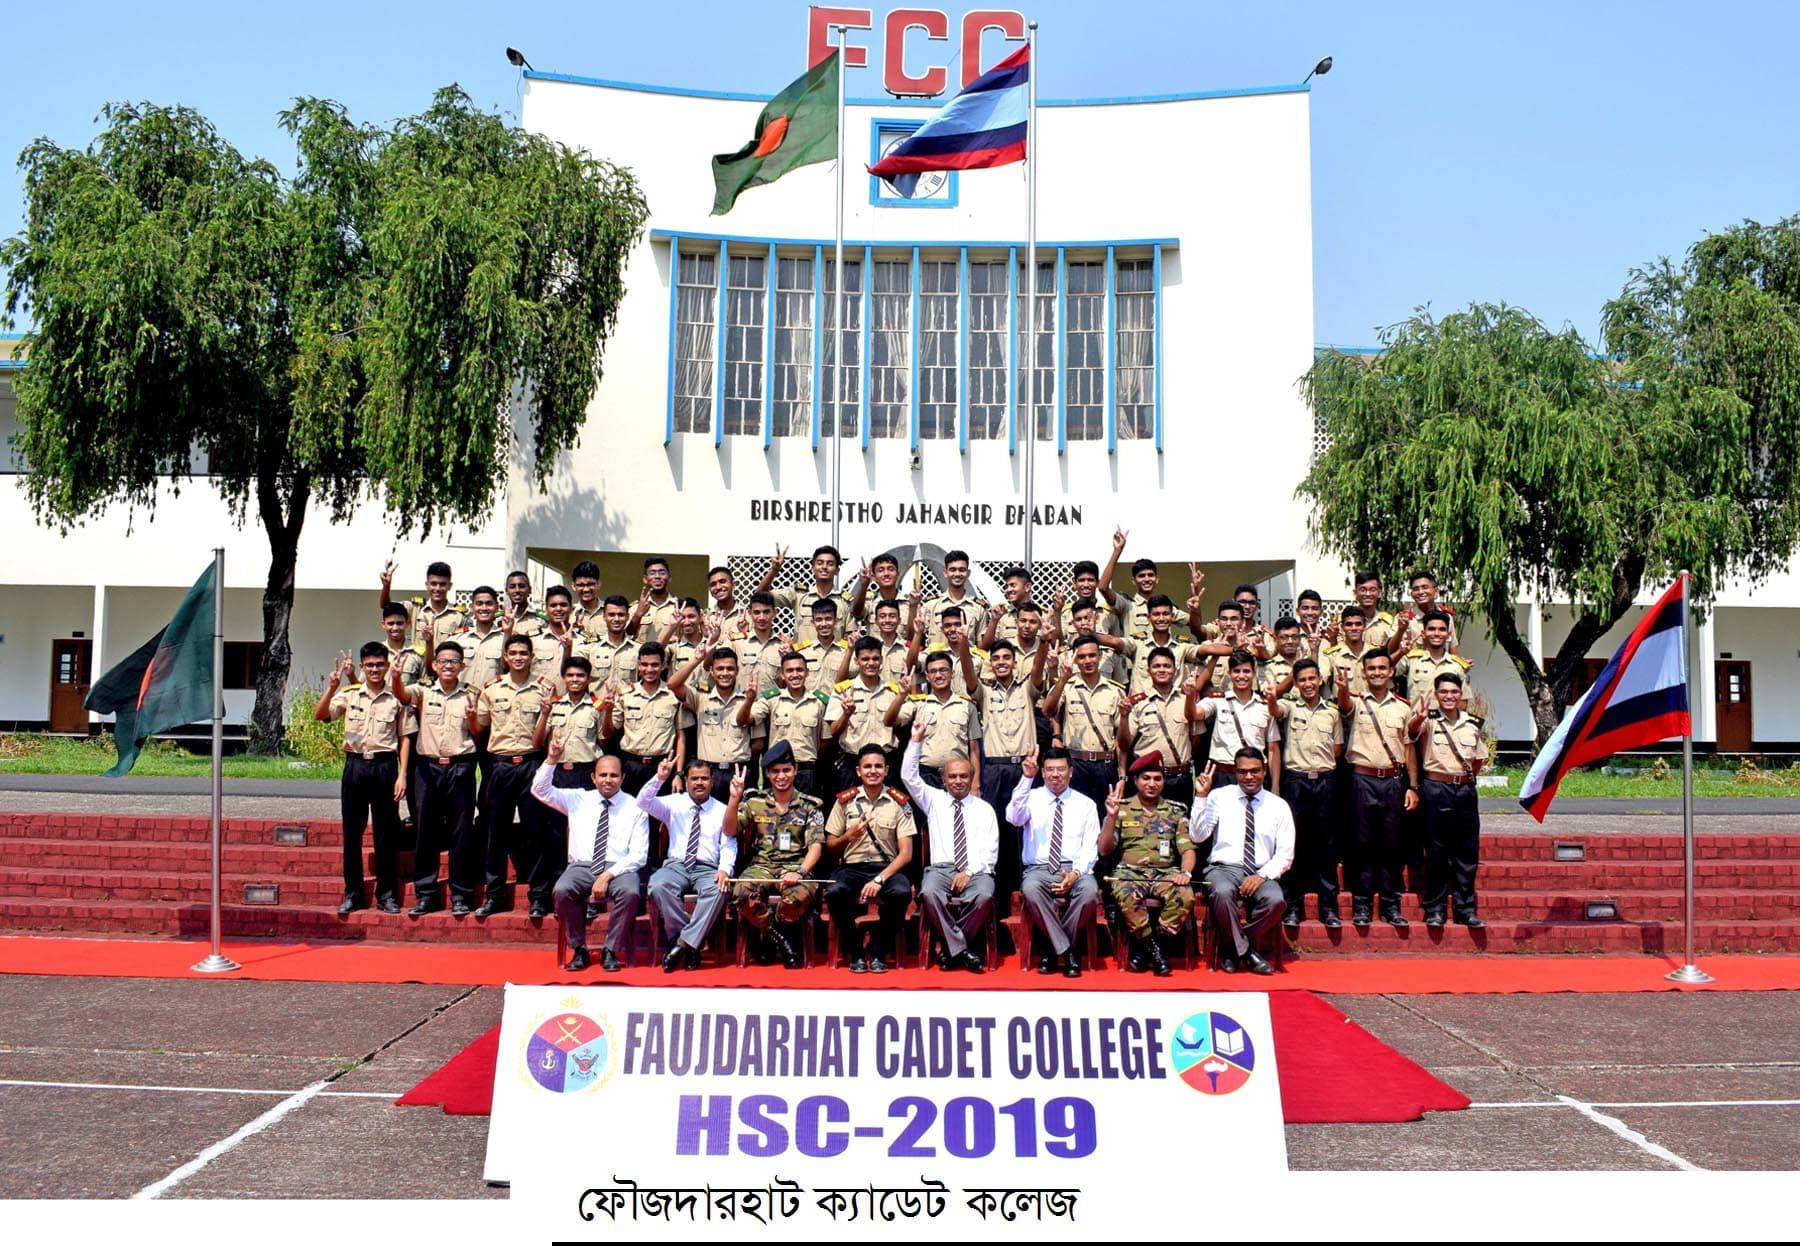 Faujdarhat Cadet College-min